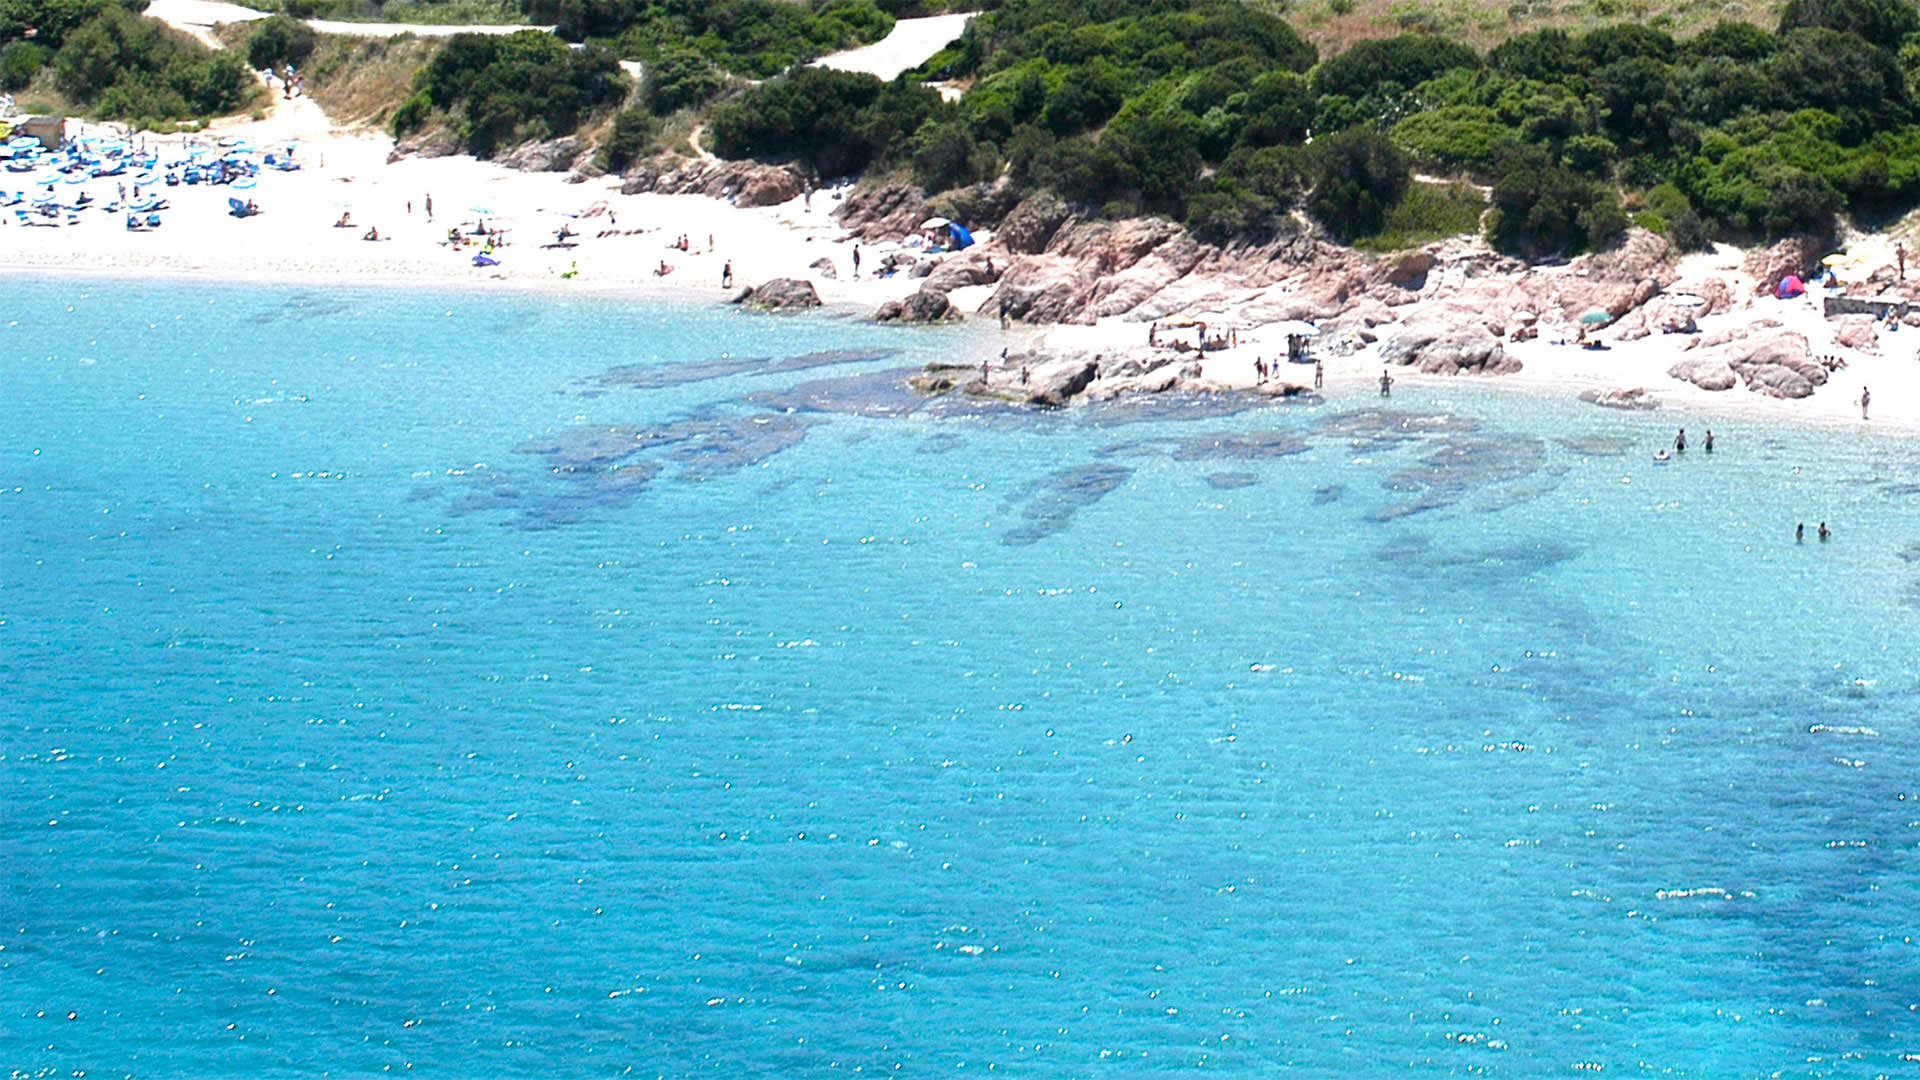 hotel-marinedda-slider-spiaggia-mare-sardegna-isola-rossa-mini